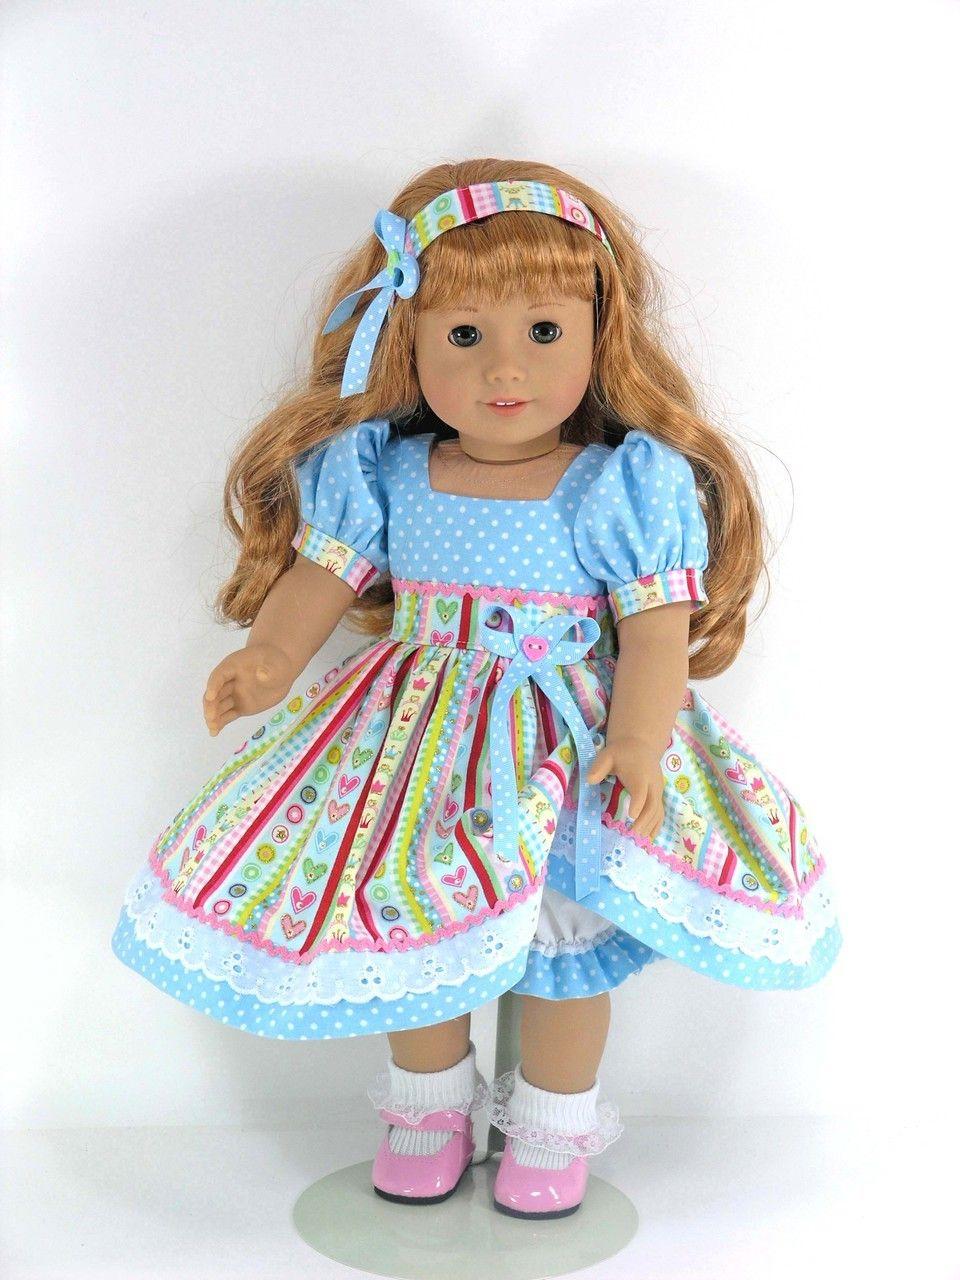 Doll Clothes for American Girl Mary Ellen - Dress, Headband ...